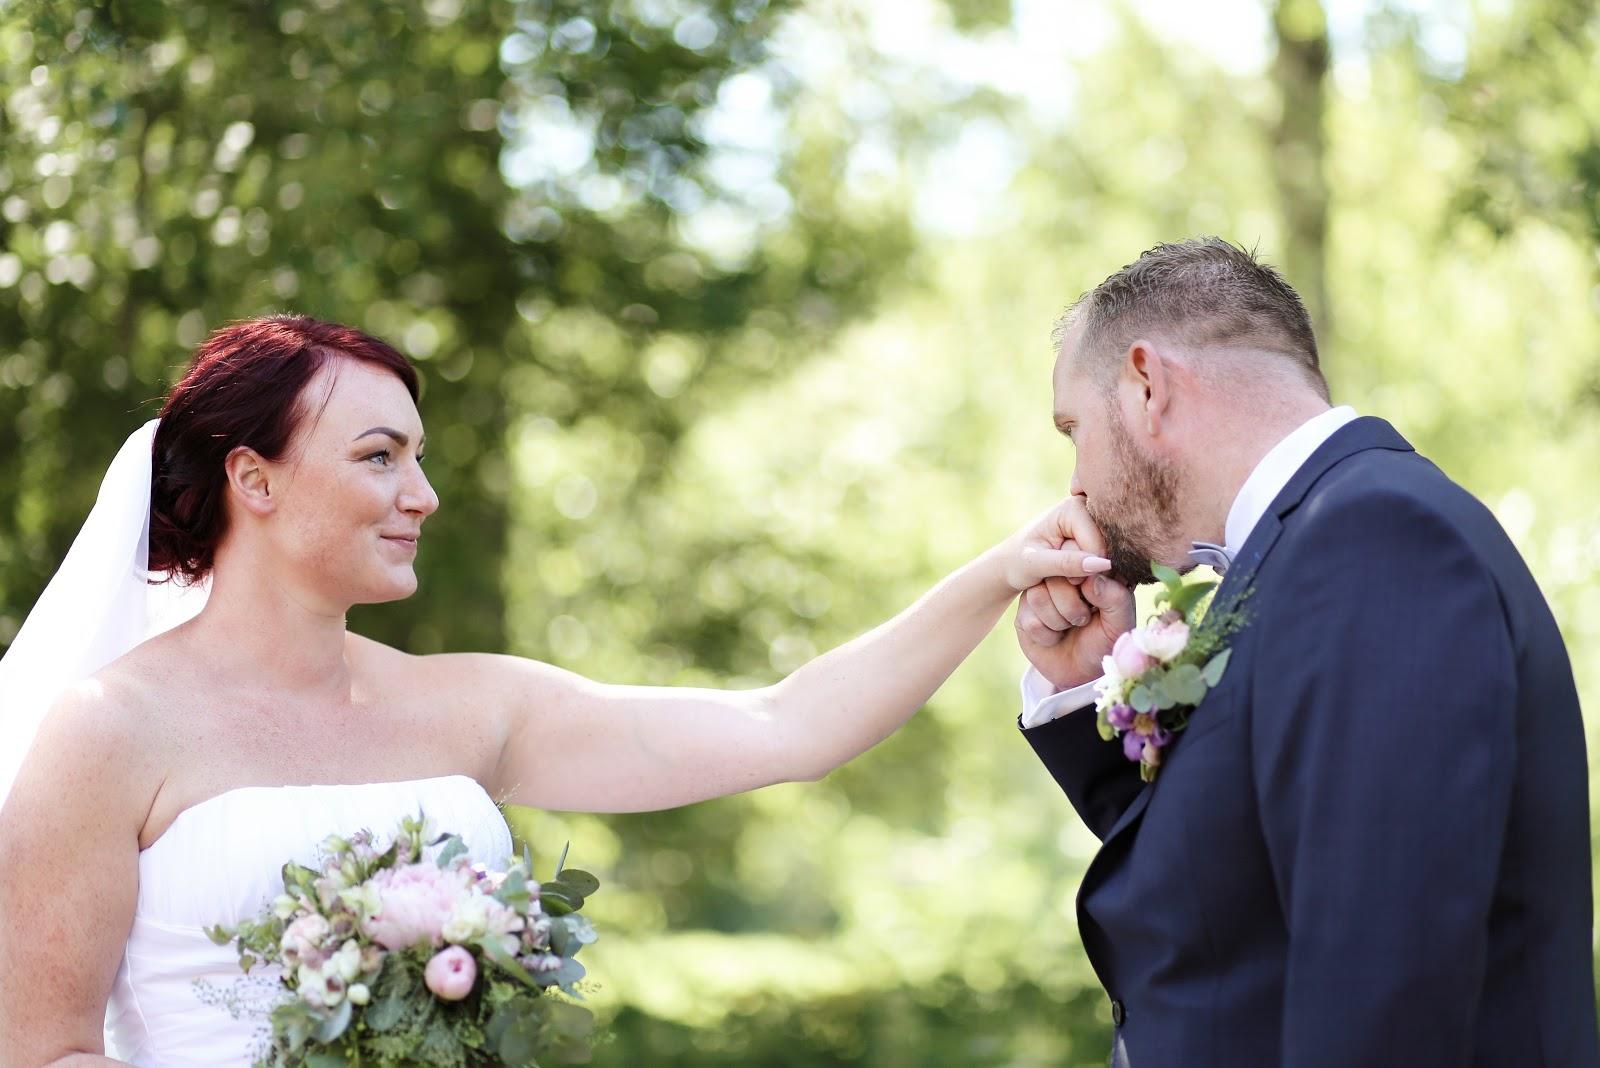 Fotograf Härnösand, bröllopsfotograf, bröllopsfoto Sundsvall Kramfors